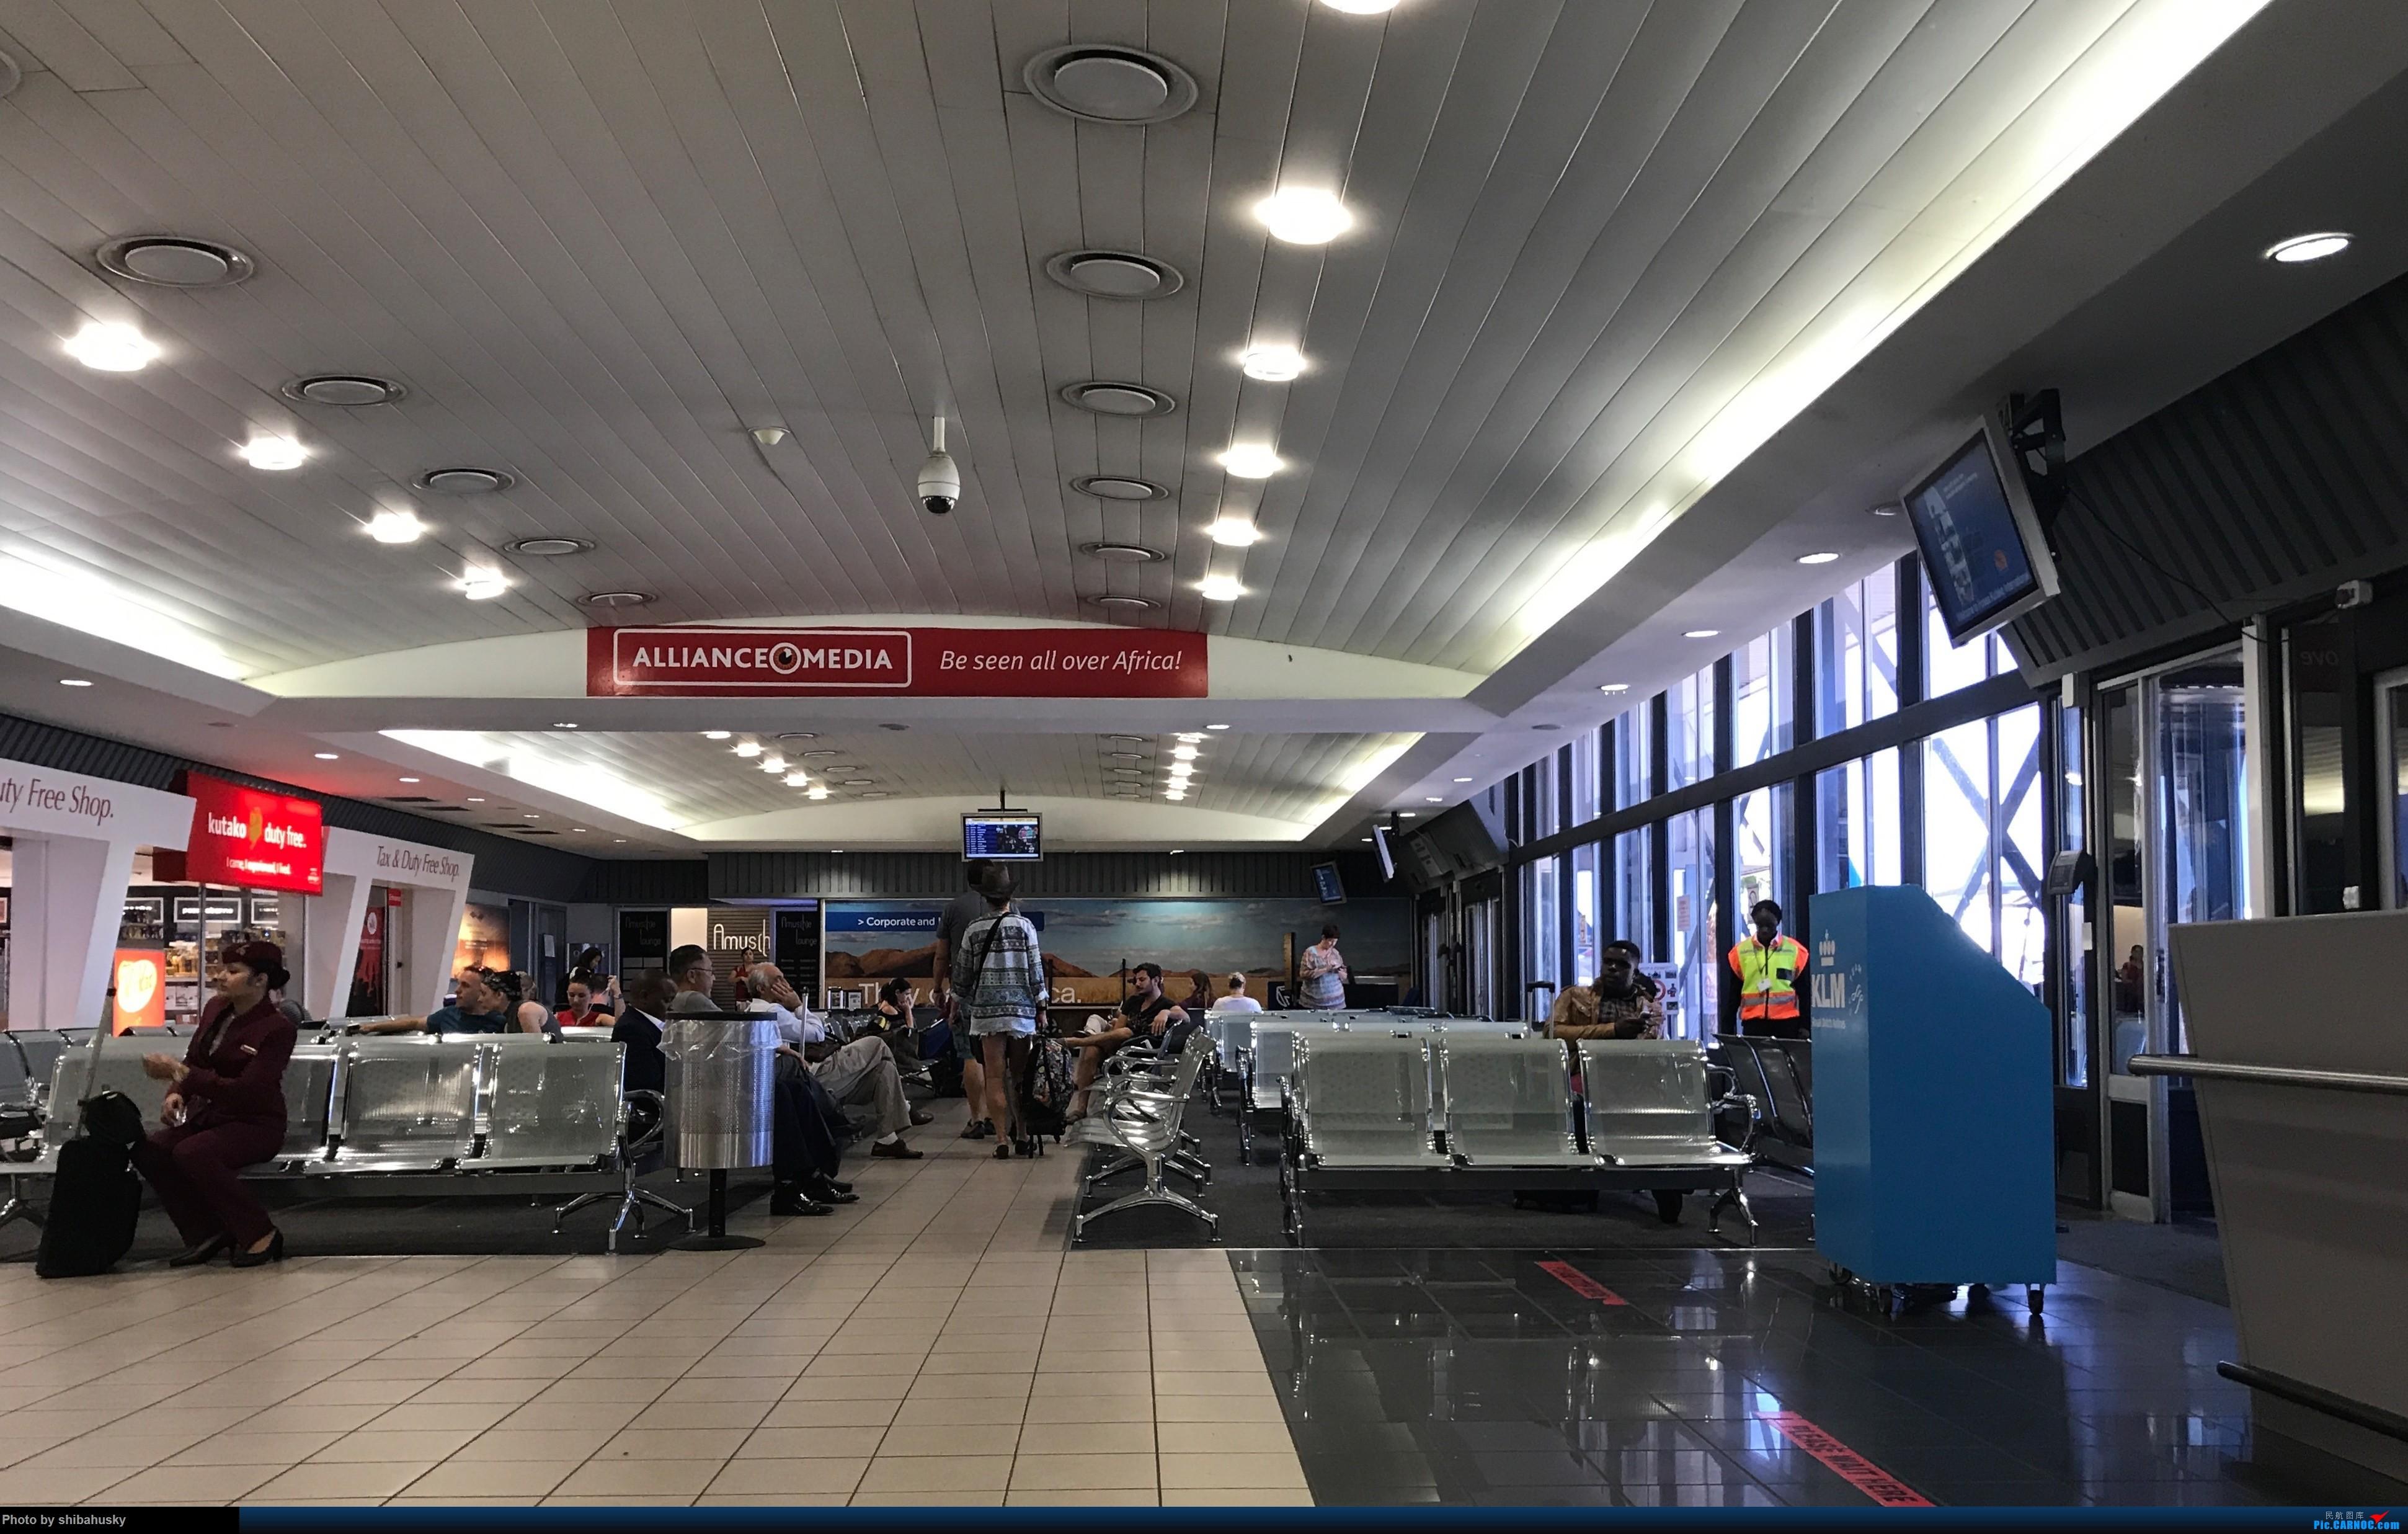 Re:[原创]新人第一帖 WVB-WDH-DOH-CDG-SOU 圣诞纳米比亚游记 体验稀有机型加辗转回英    纳米比亚温得和克卢格哈威机场